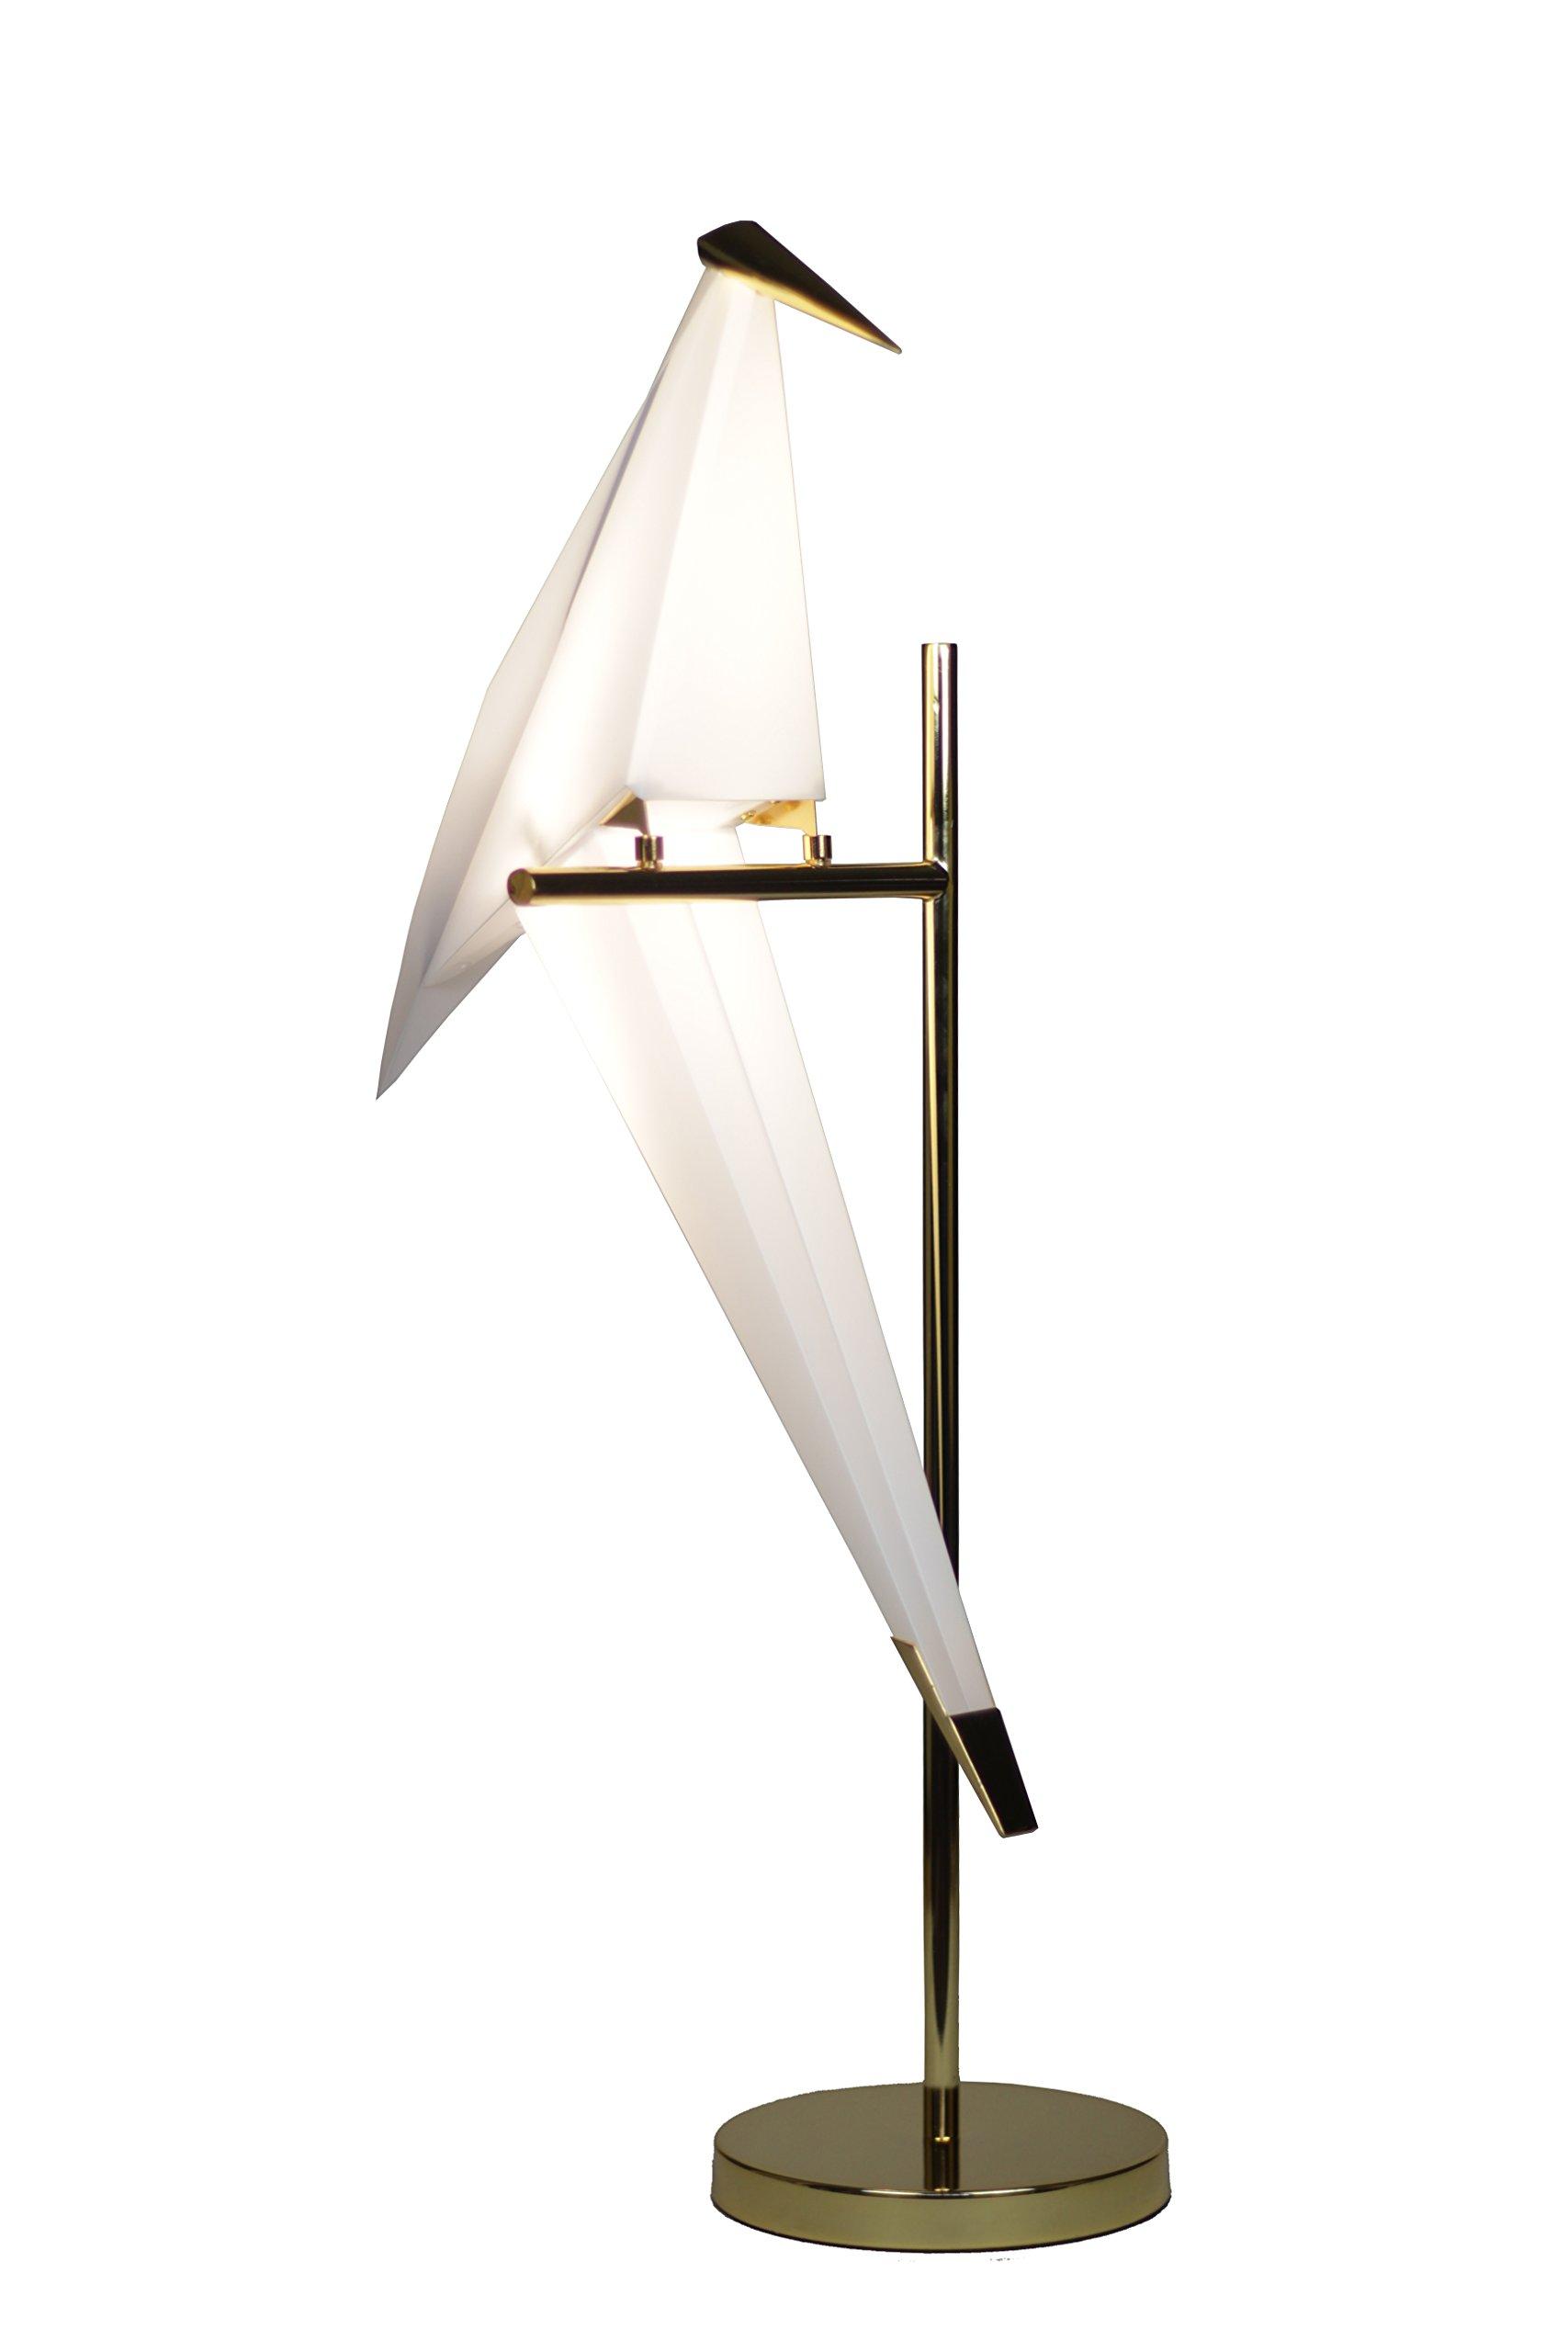 ویکالا · خرید  اصل اورجینال · خرید از آمازون · EQLight EQBLT03 Birdie Light Origami Fauna Bird Table Lamp, Gold wekala · ویکالا